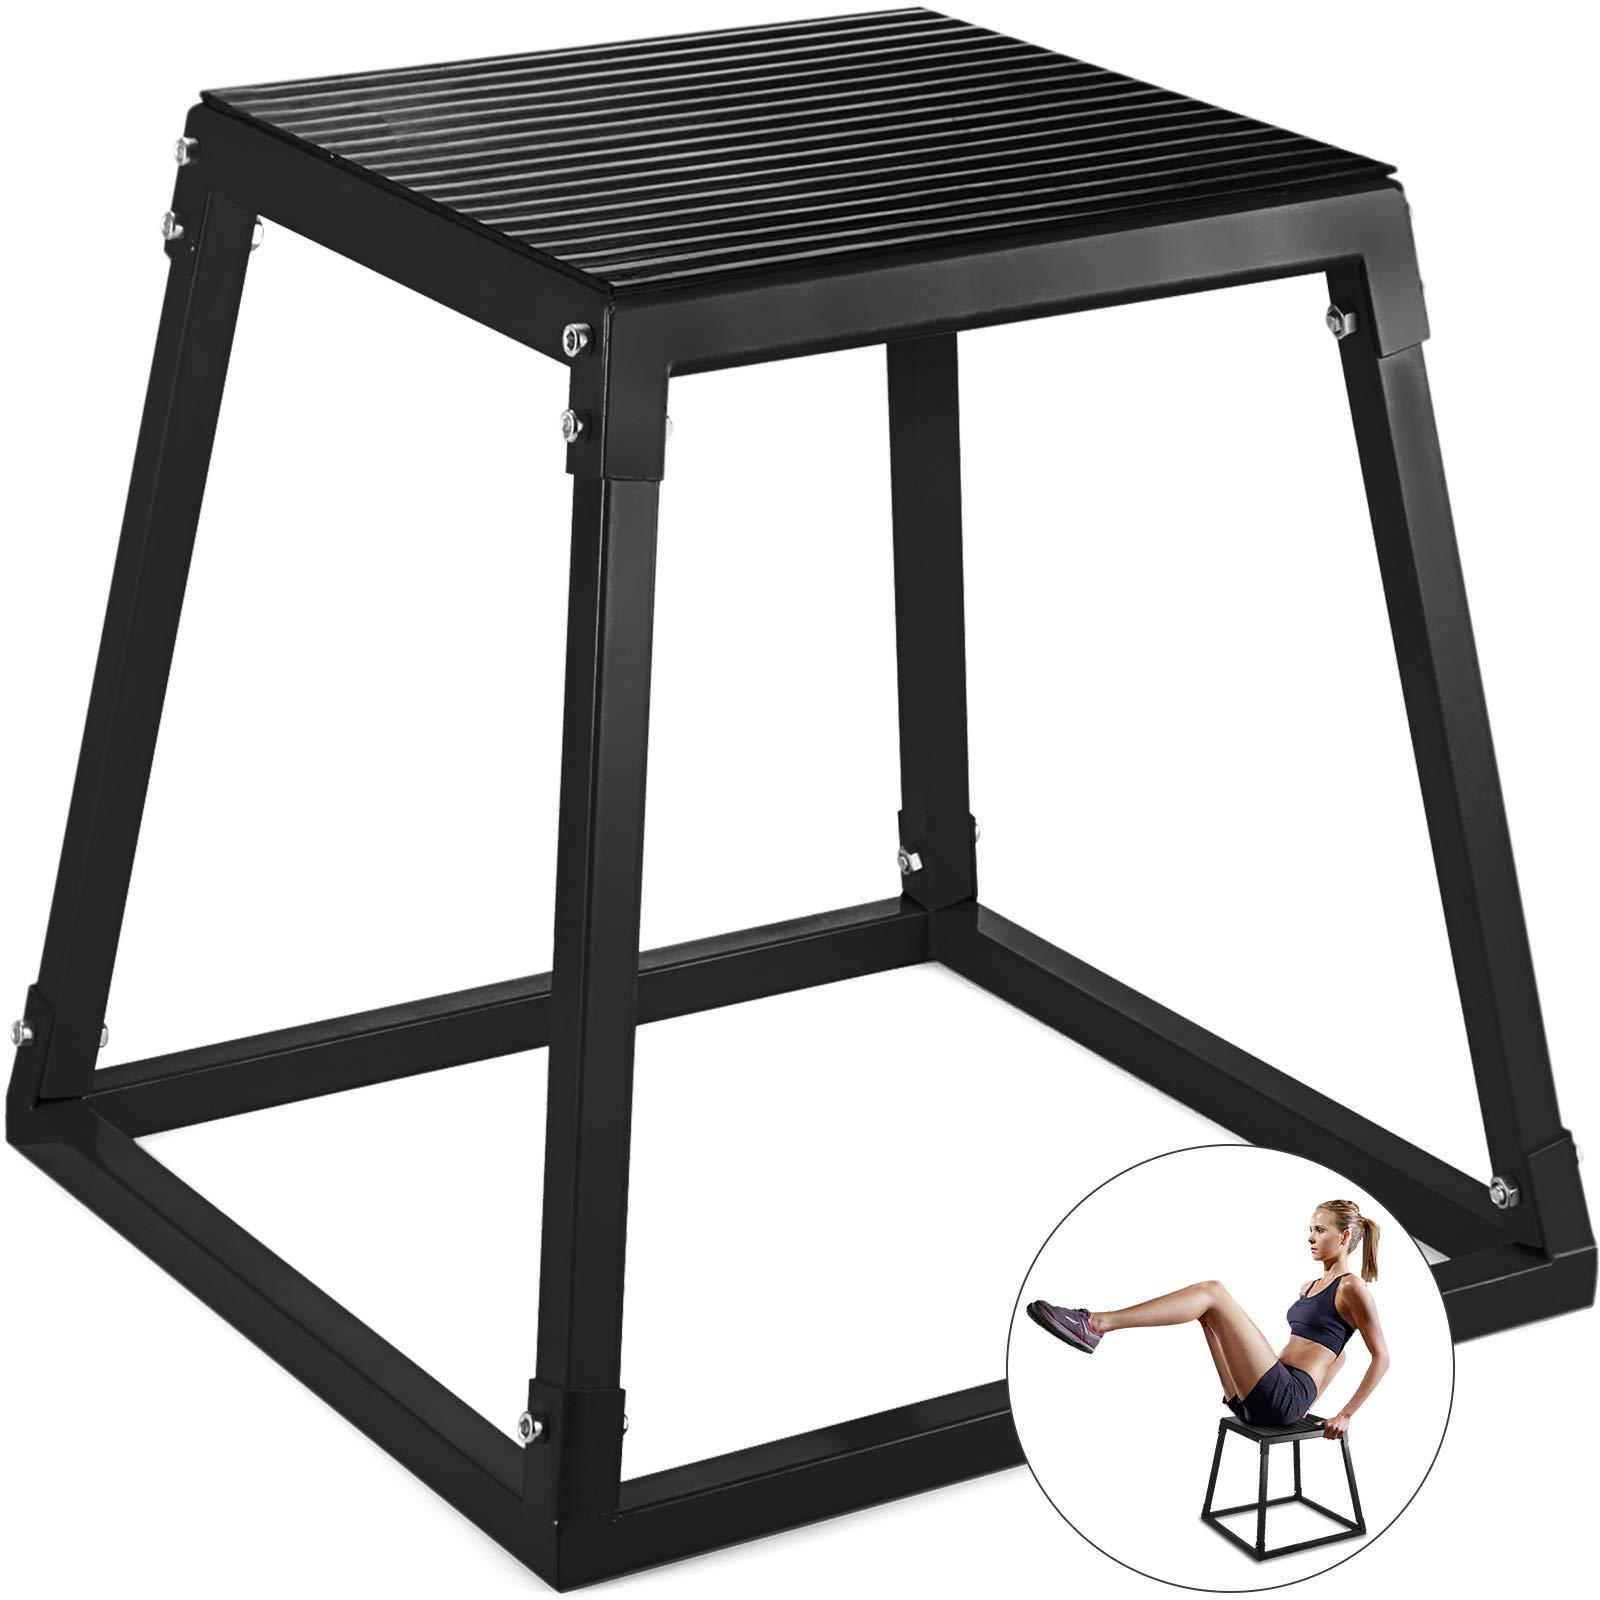 VEVOR Jumping Box 30¡± Platform Jump Box Exercise Plyometric Jump Boxes for Jump Training(30'',Black)